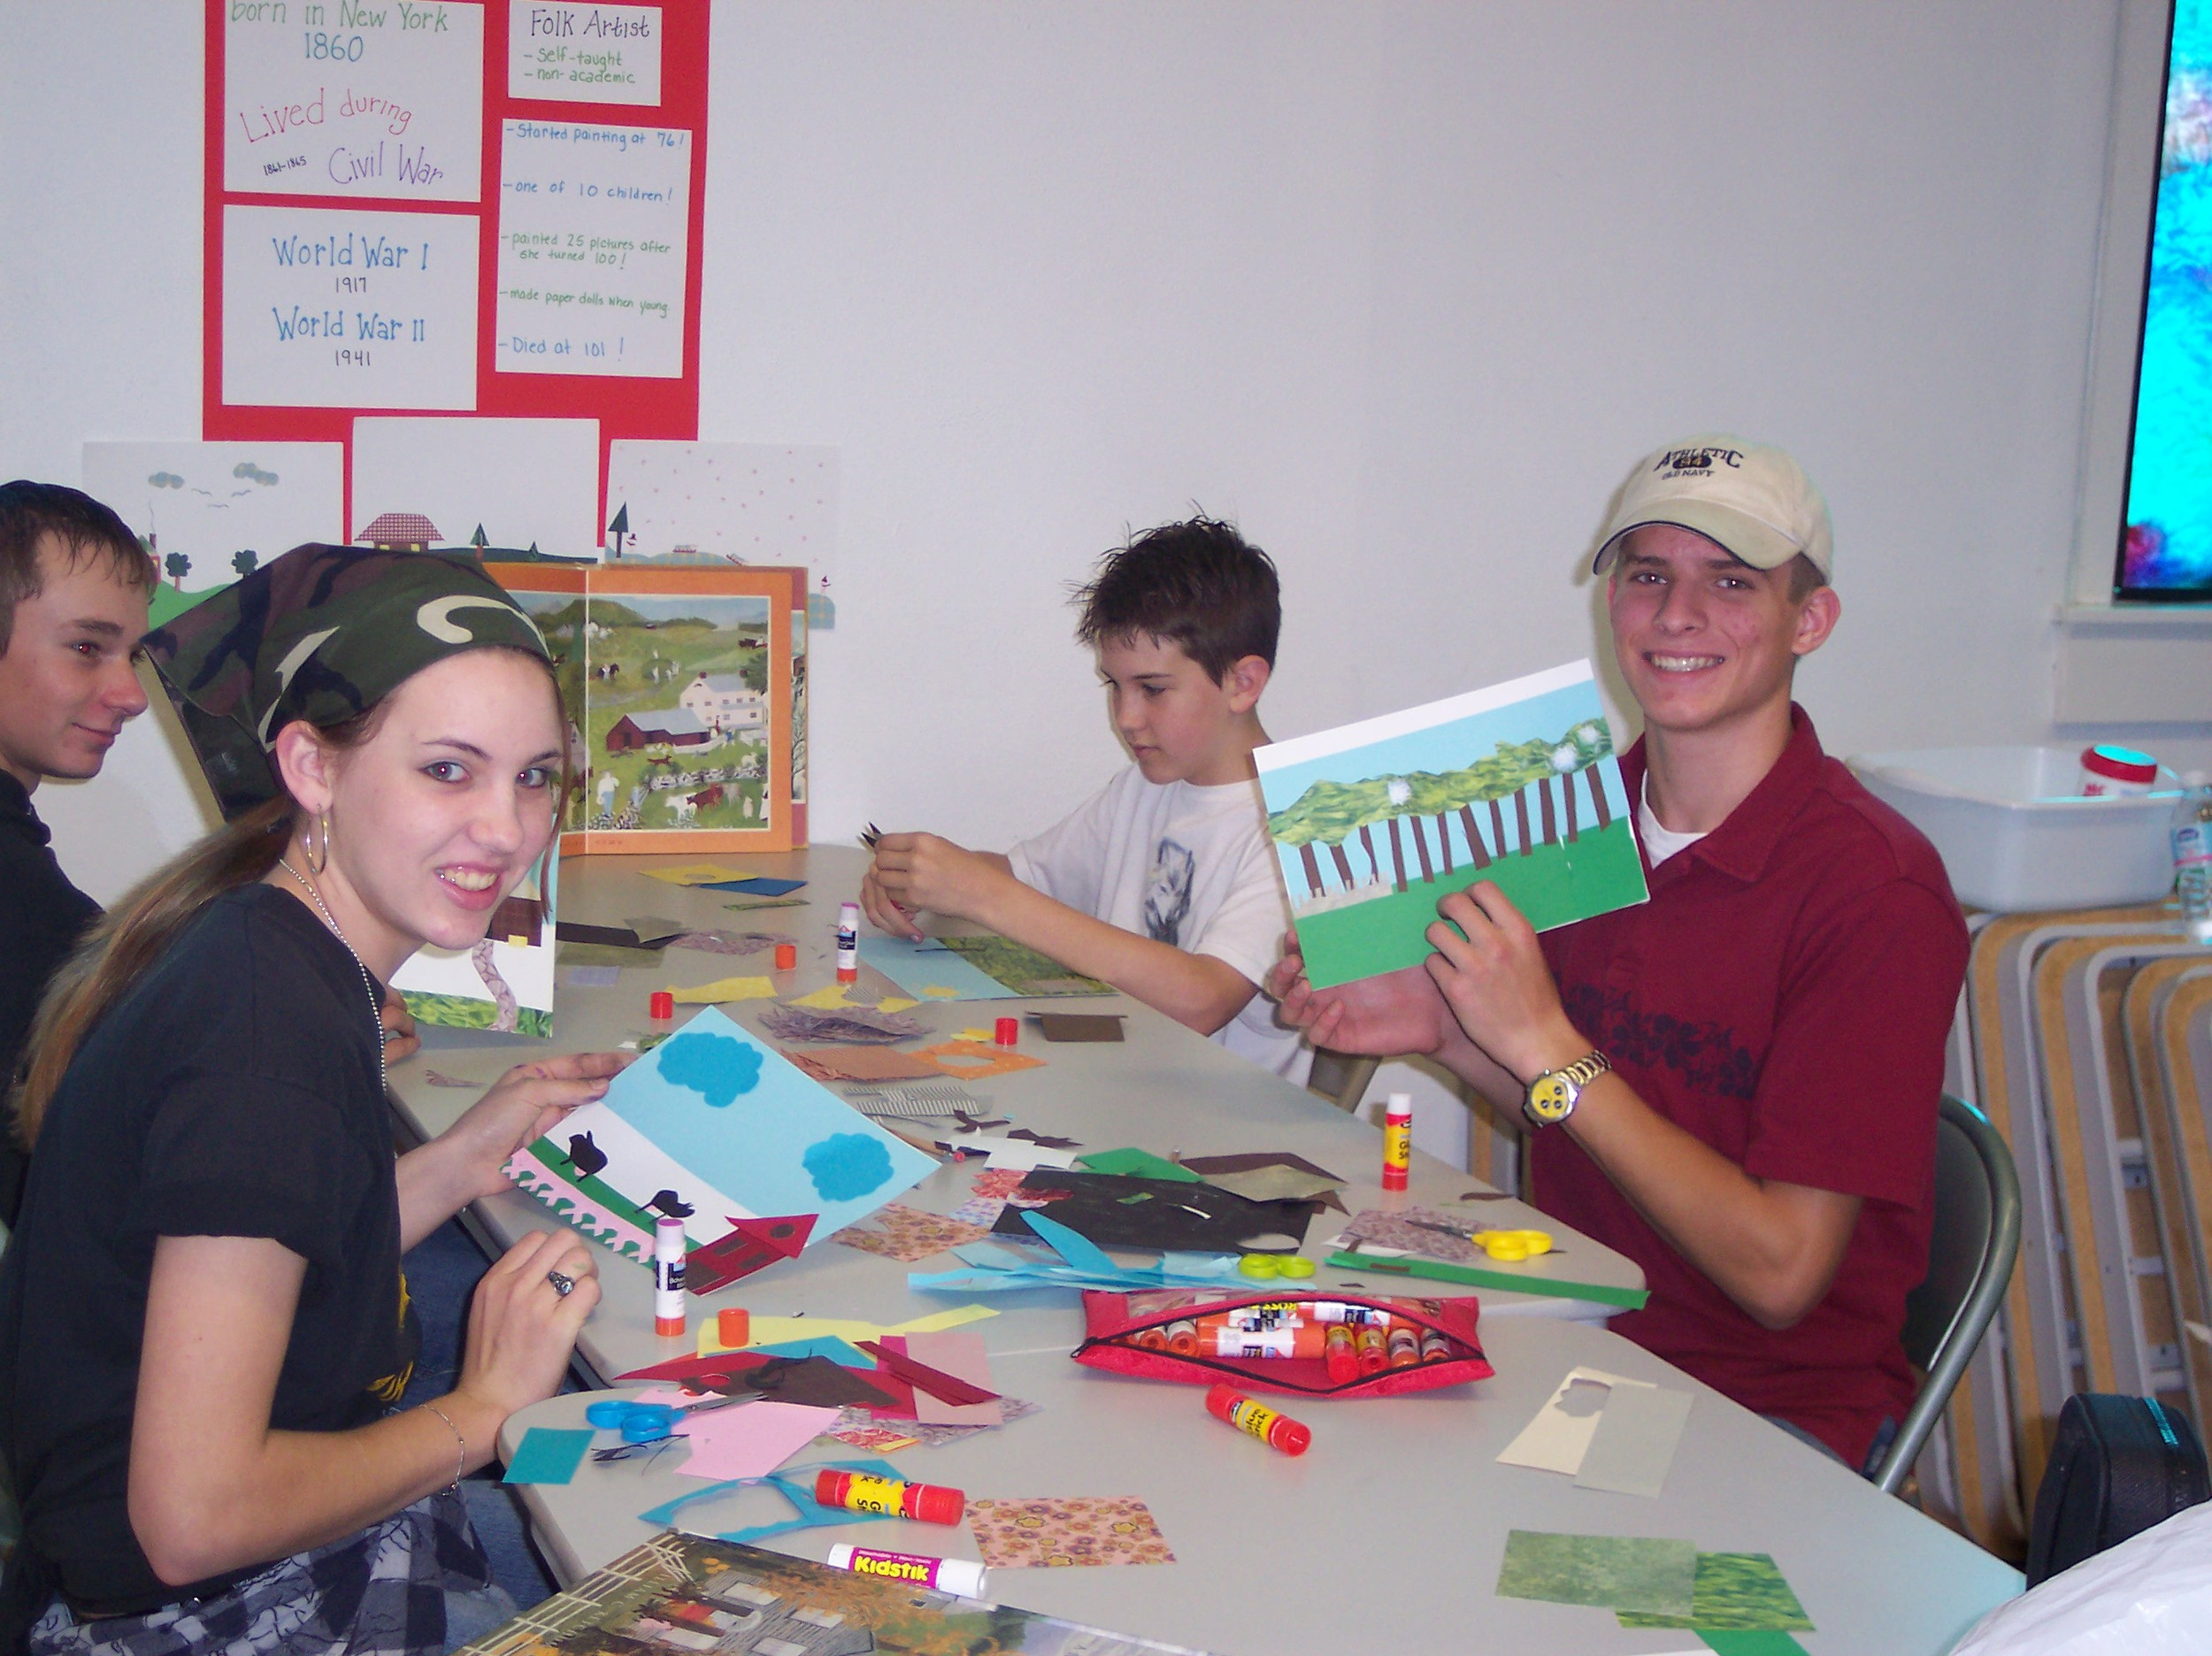 HOMESCHOOL ART FESTIVAL, RYAN2004